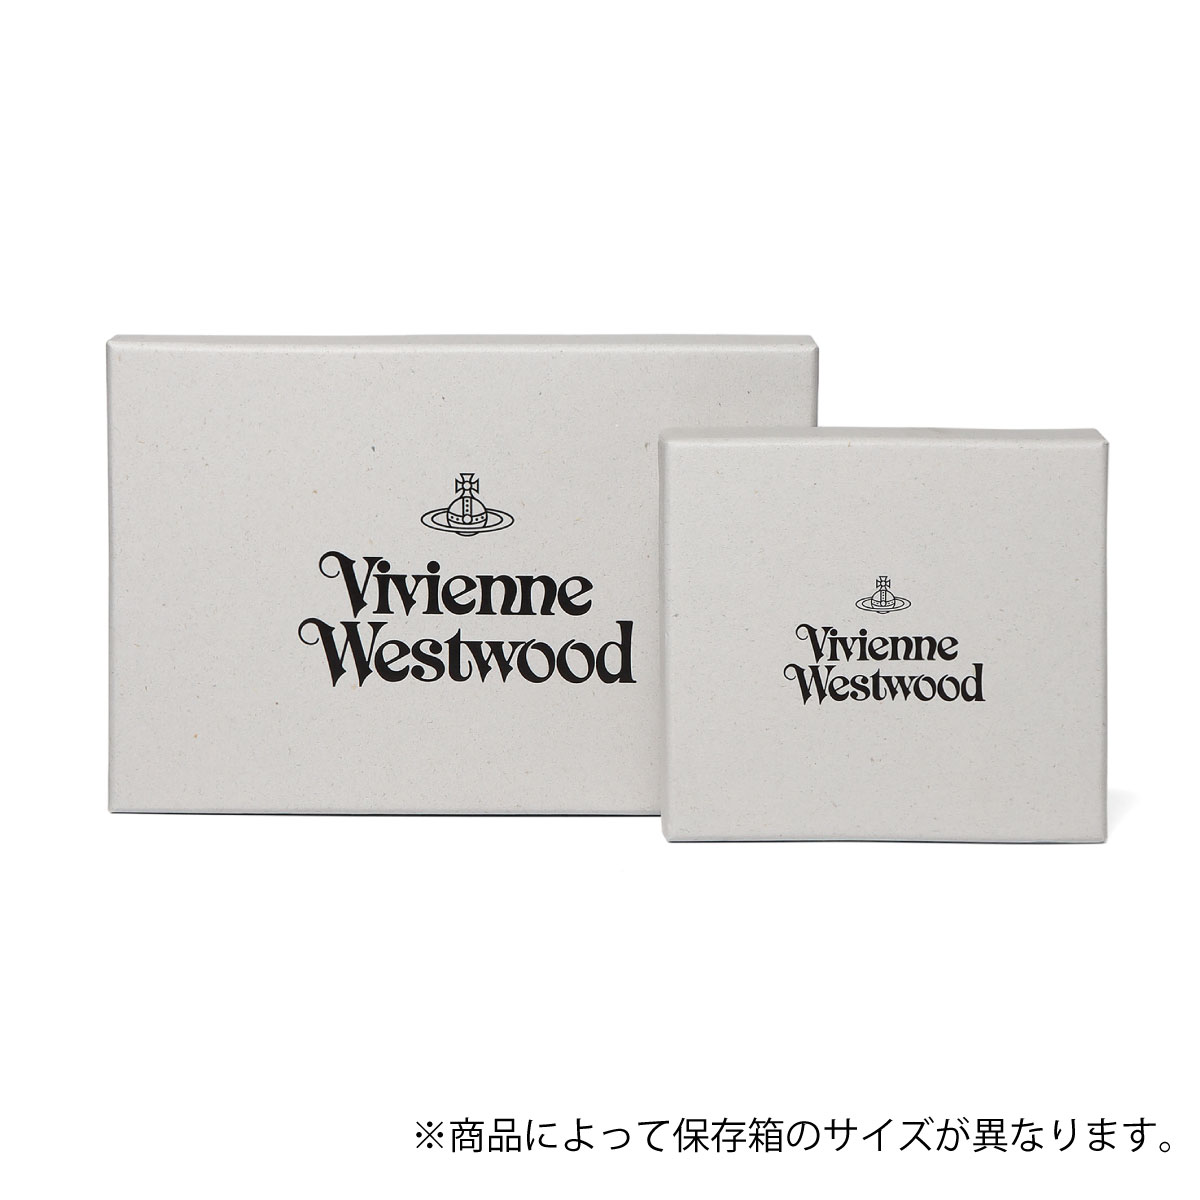 VIVIENNE WESTWOOD ヴィヴィアン ウエストウッド | 二つ折り長財布 | VICTORIA ヴィクトリア